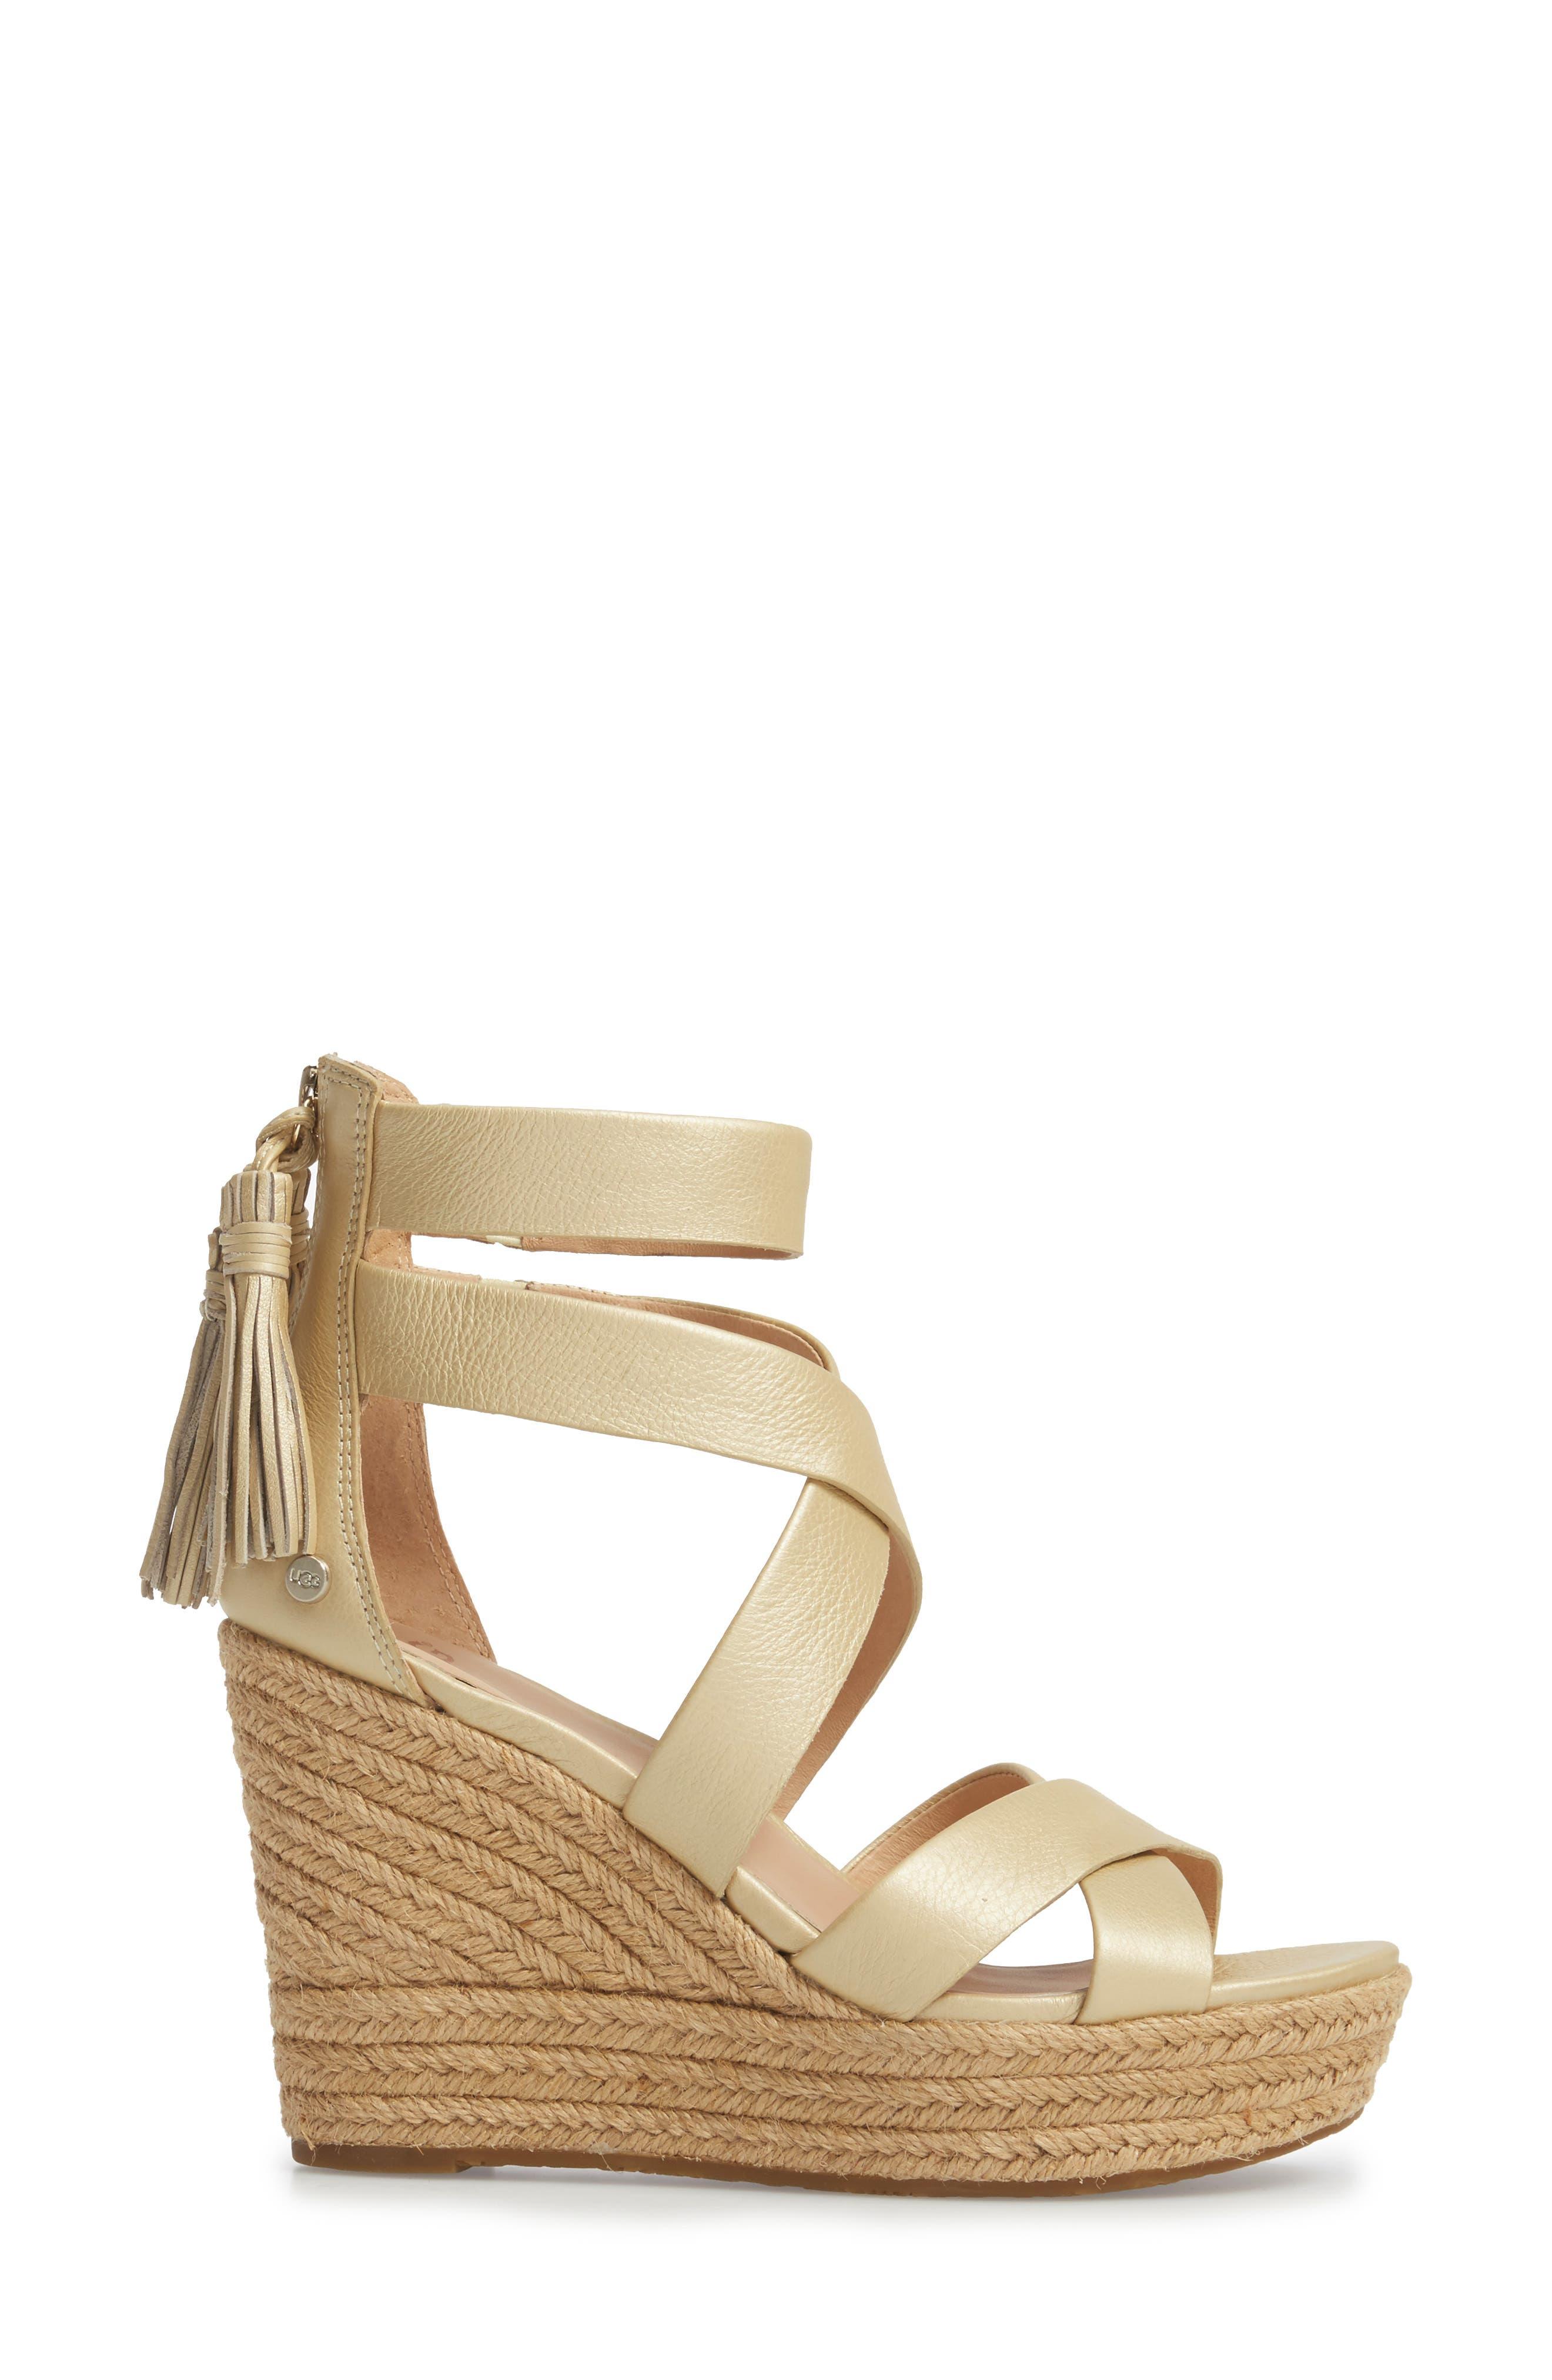 Raquel Platform Wedge Sandal,                             Alternate thumbnail 3, color,                             Soft Gold Leather